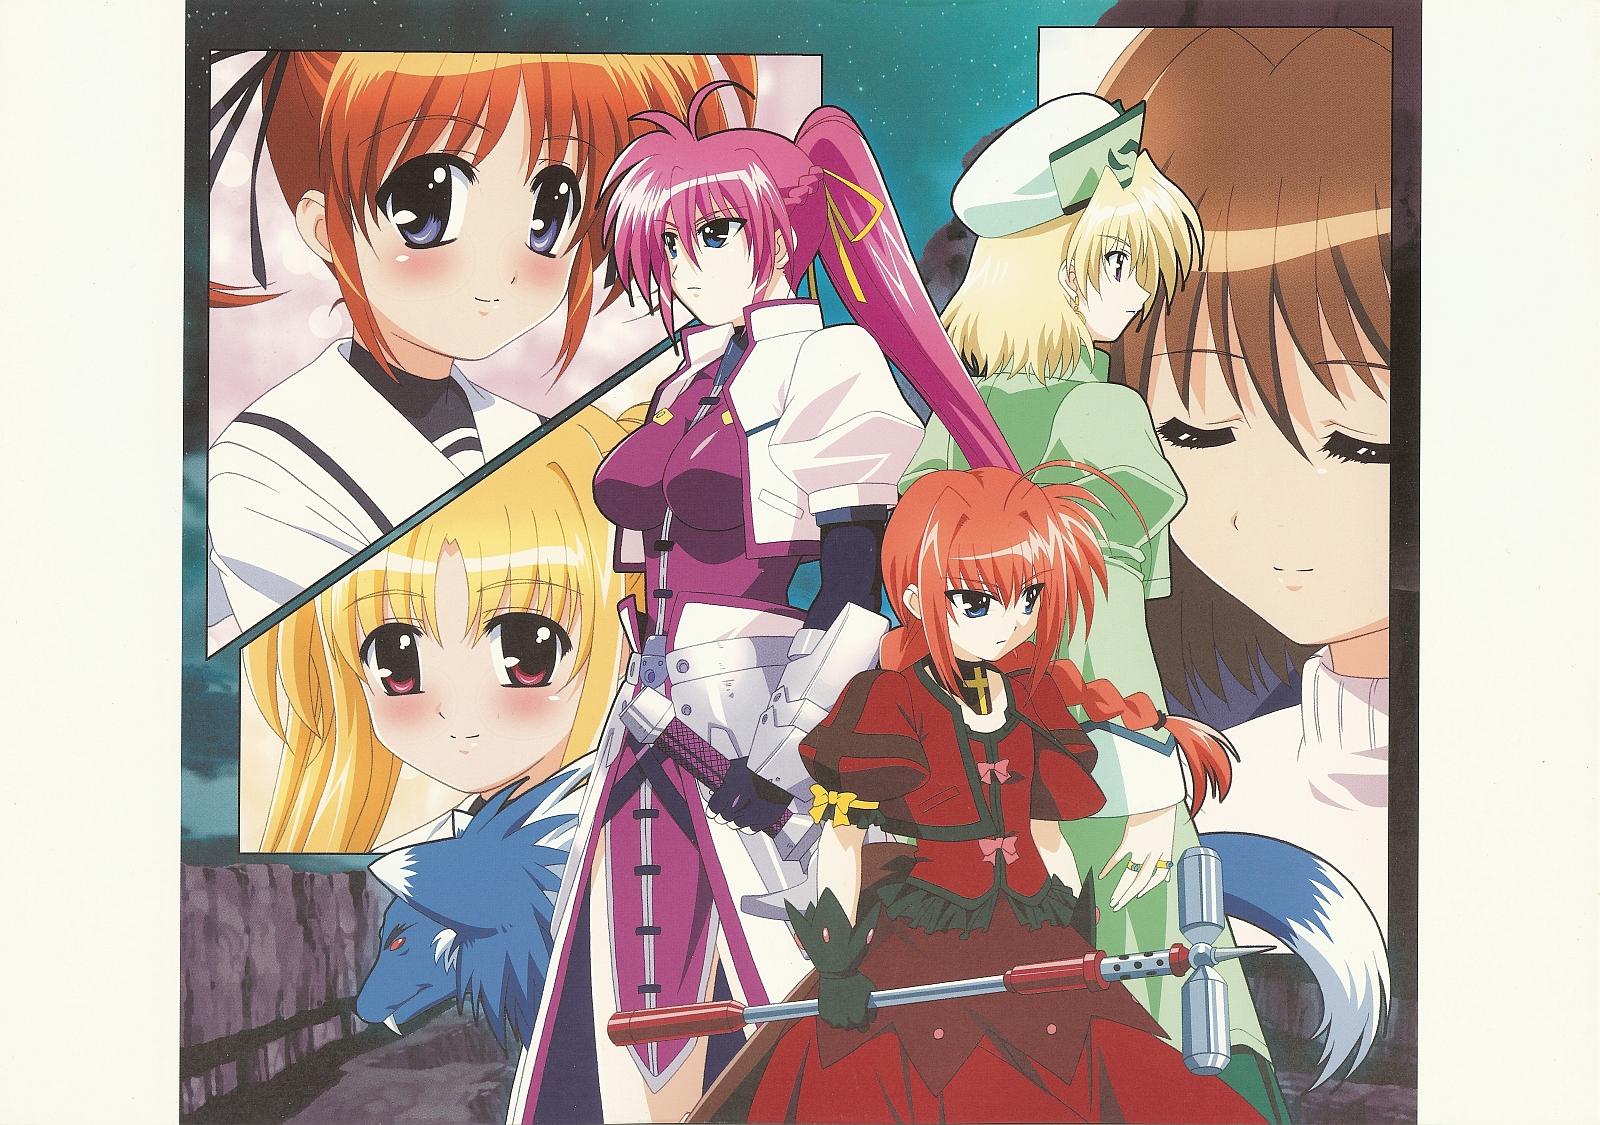 fate_testarossa mahou_shoujo_lyrical_nanoha shamal signum takamachi_nanoha vita yagami_hayate zafira